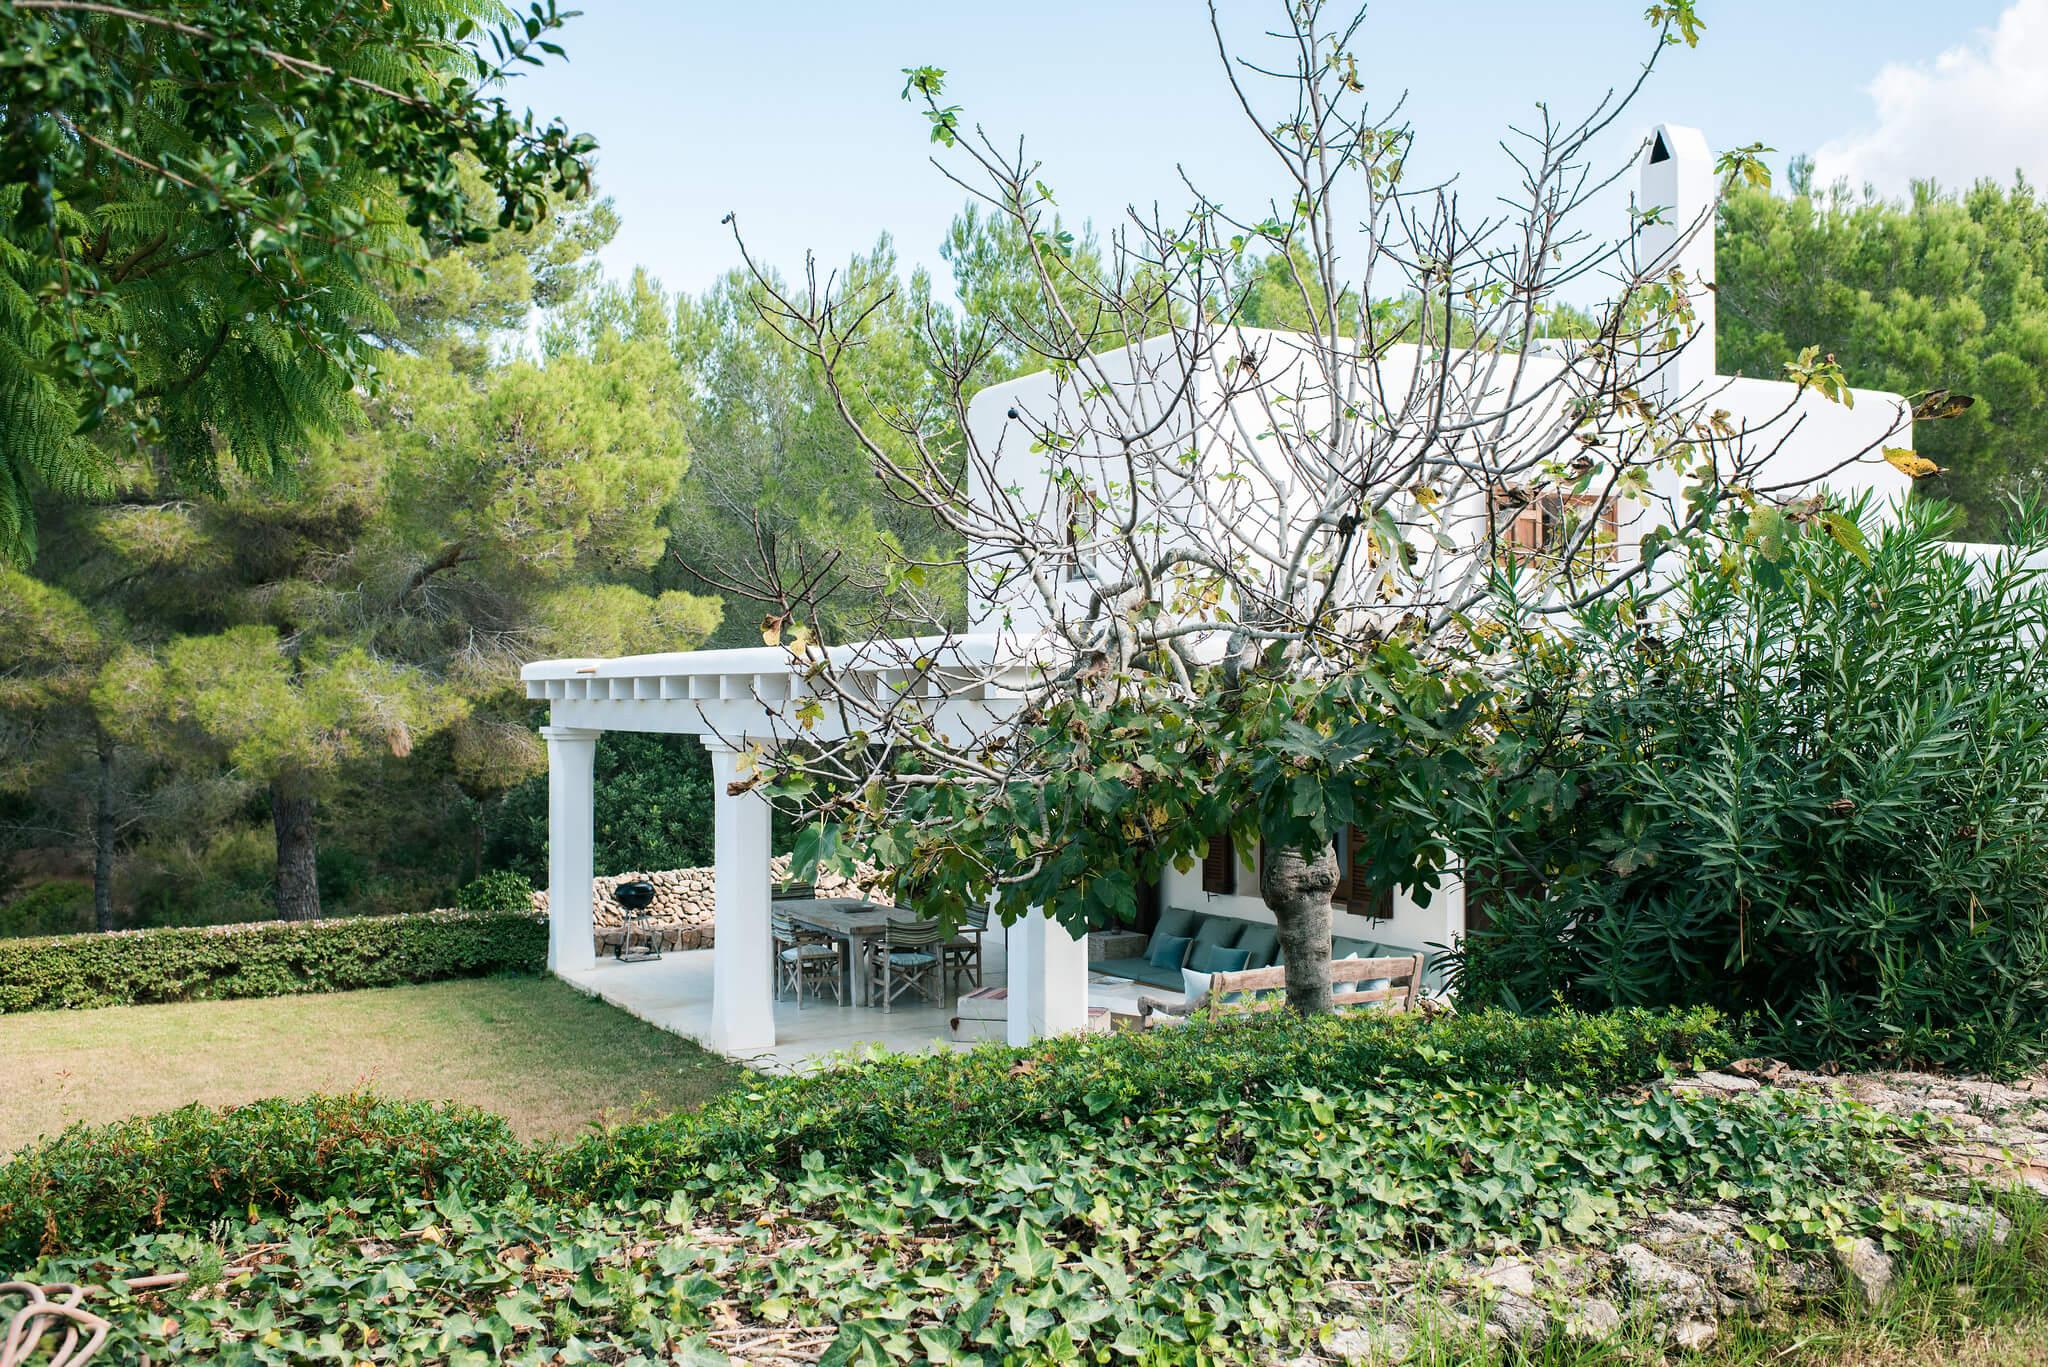 https://www.white-ibiza.com/wp-content/uploads/2020/06/white-ibiza-villas-casa-arabella-exterior-garden-high.jpg